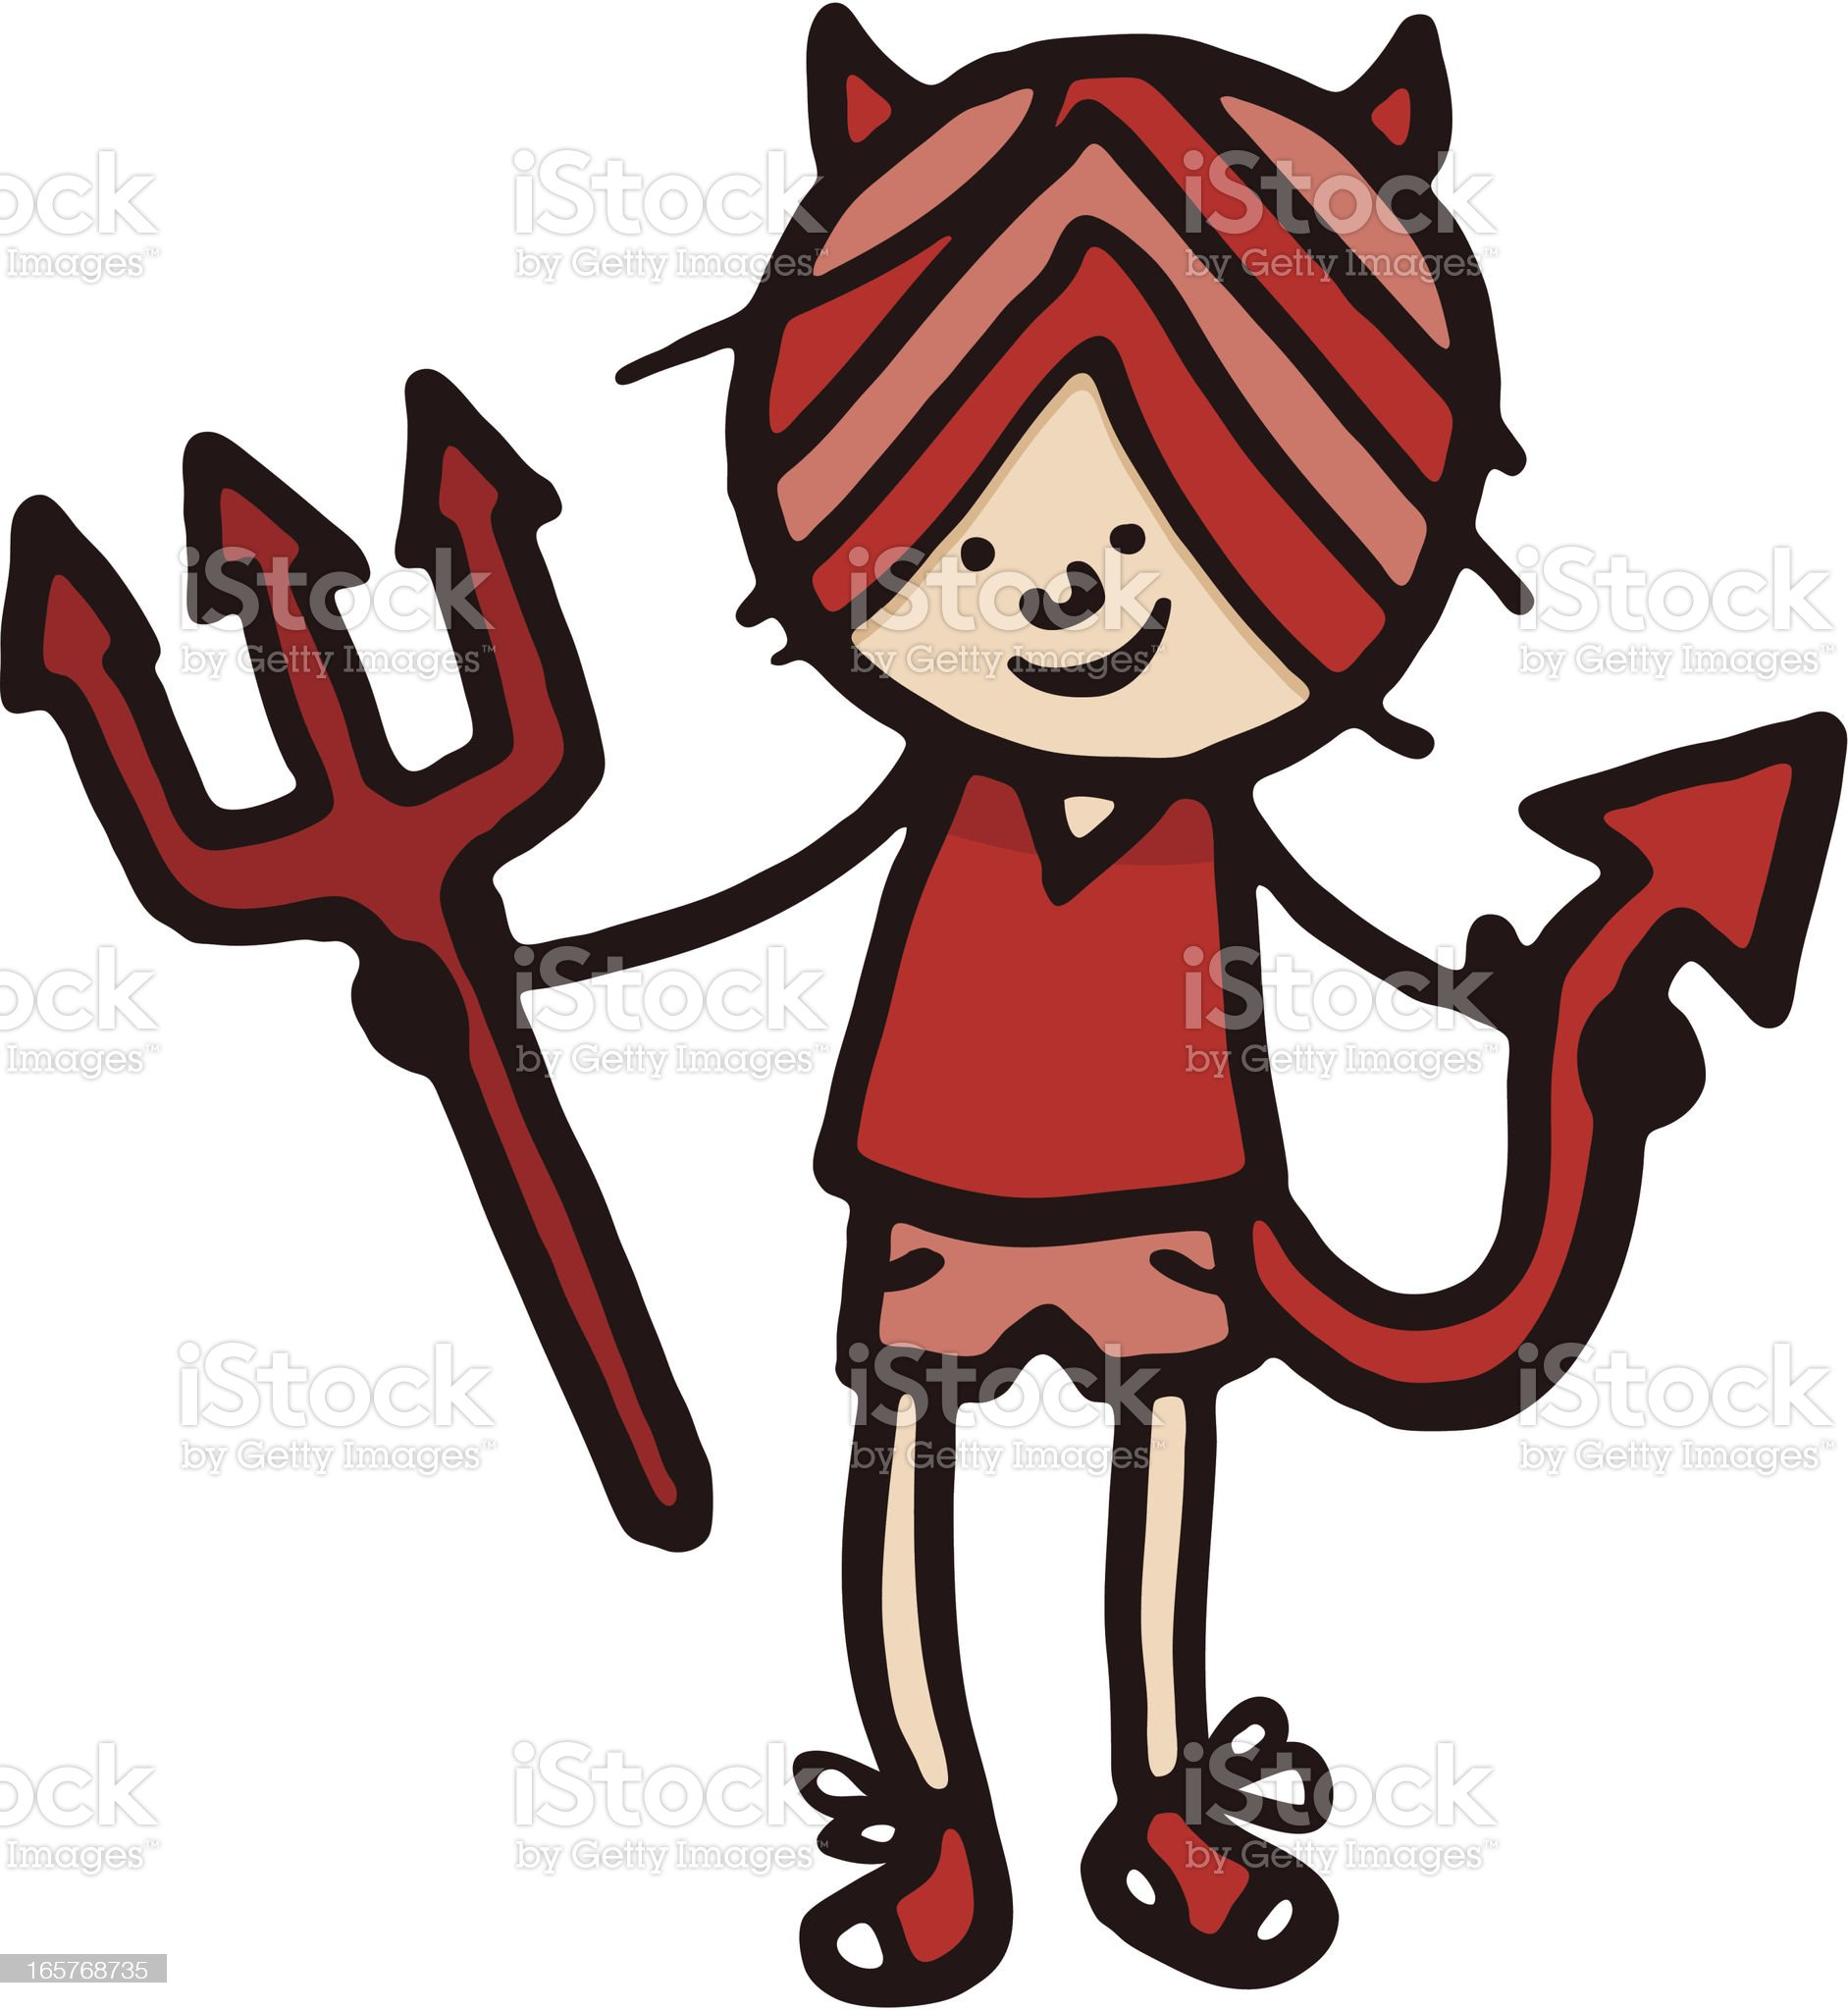 Devil boy royalty-free stock vector art